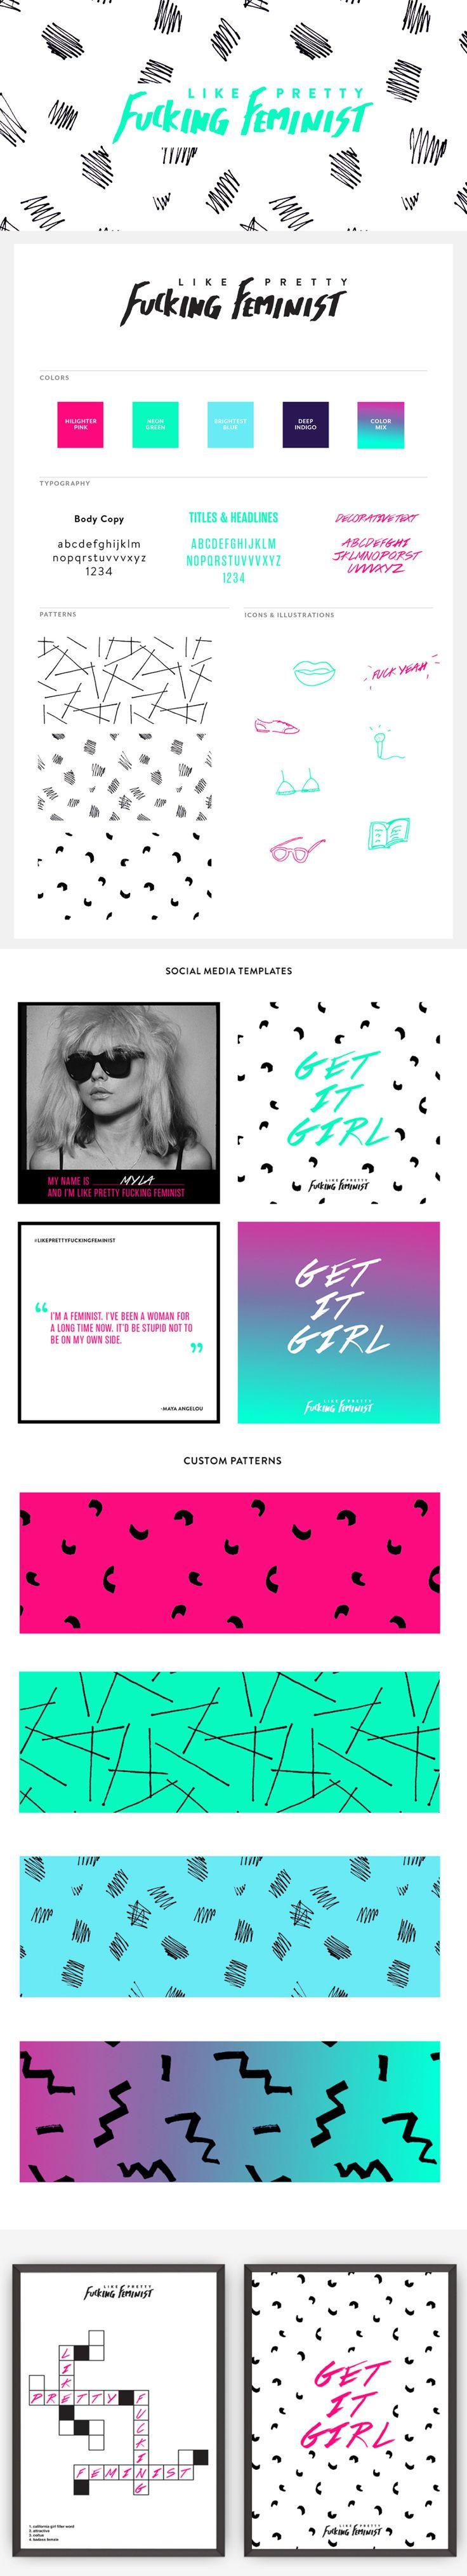 Like Pretty Fucking Feminist Brand Identity | Little Trailer Studio. Click through to view details.